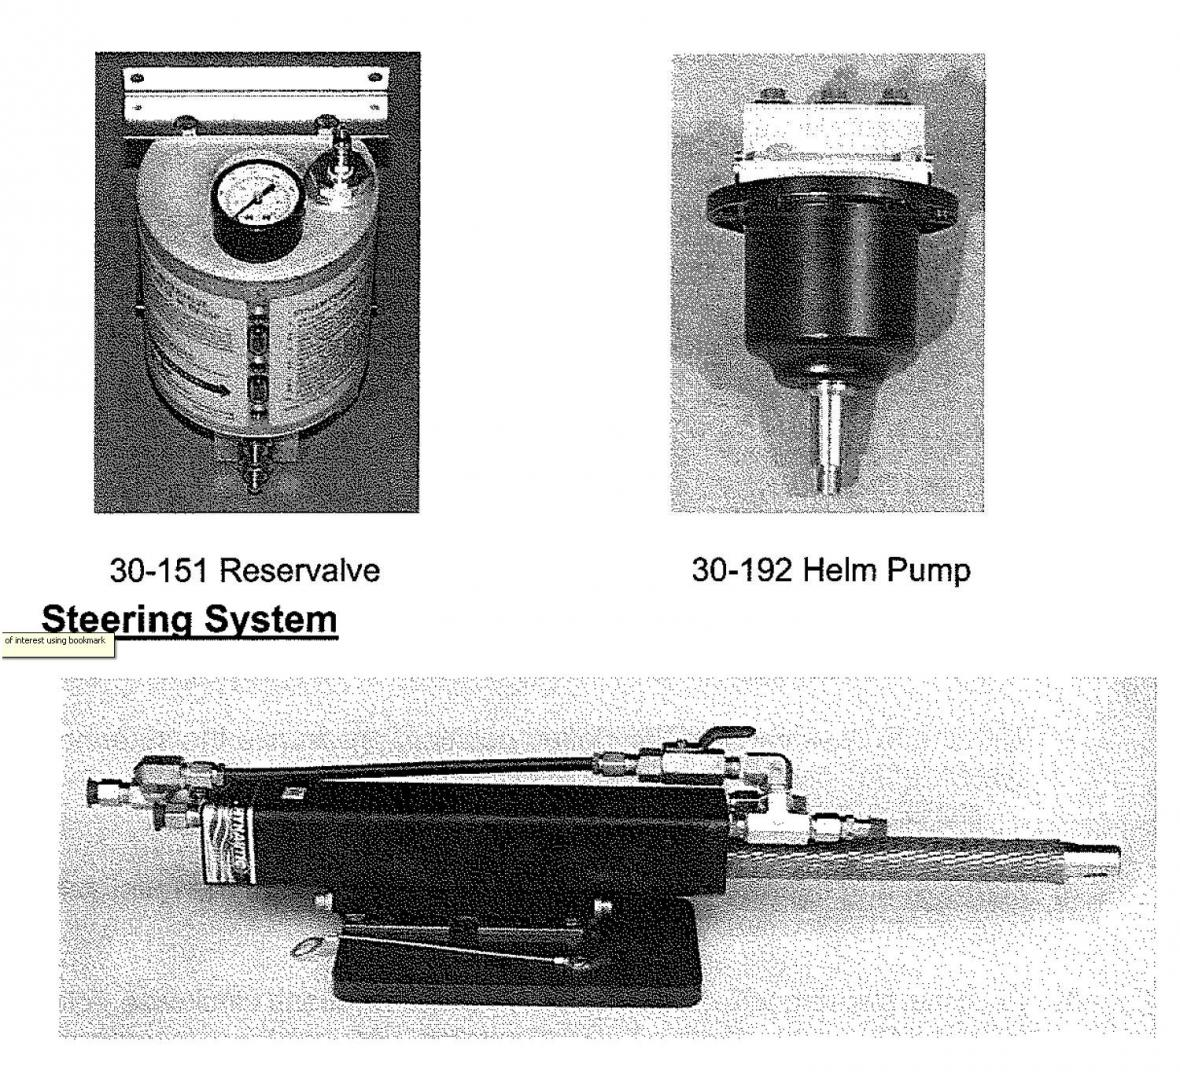 Helm Pump Leak US Navy 7m - RIBnet Forums